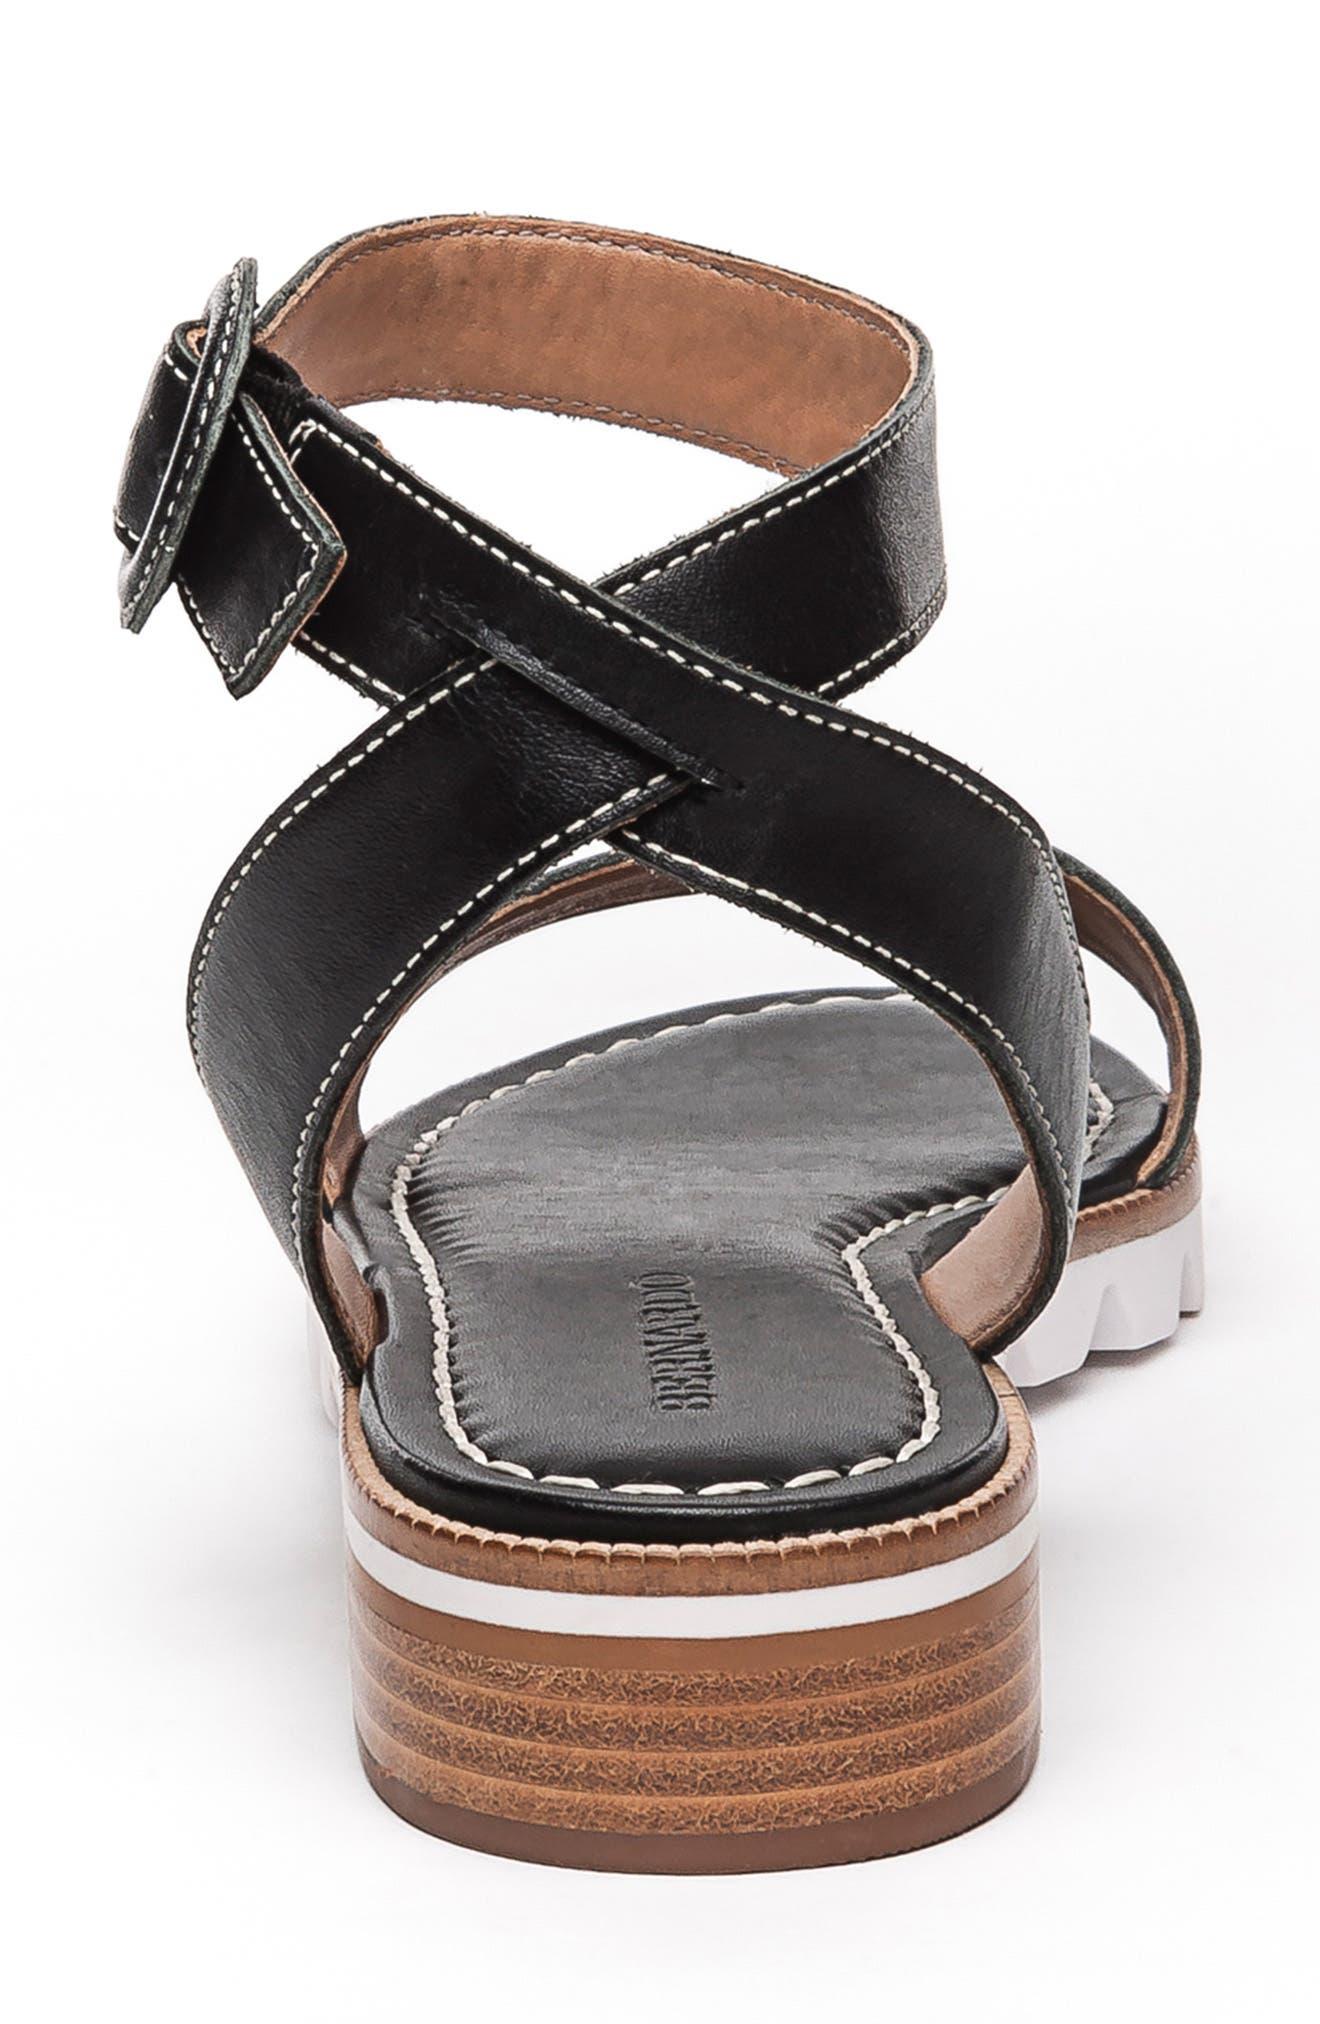 BERNARDO, Footwear Alexis Ankle Strap Sandal, Alternate thumbnail 7, color, BLACK